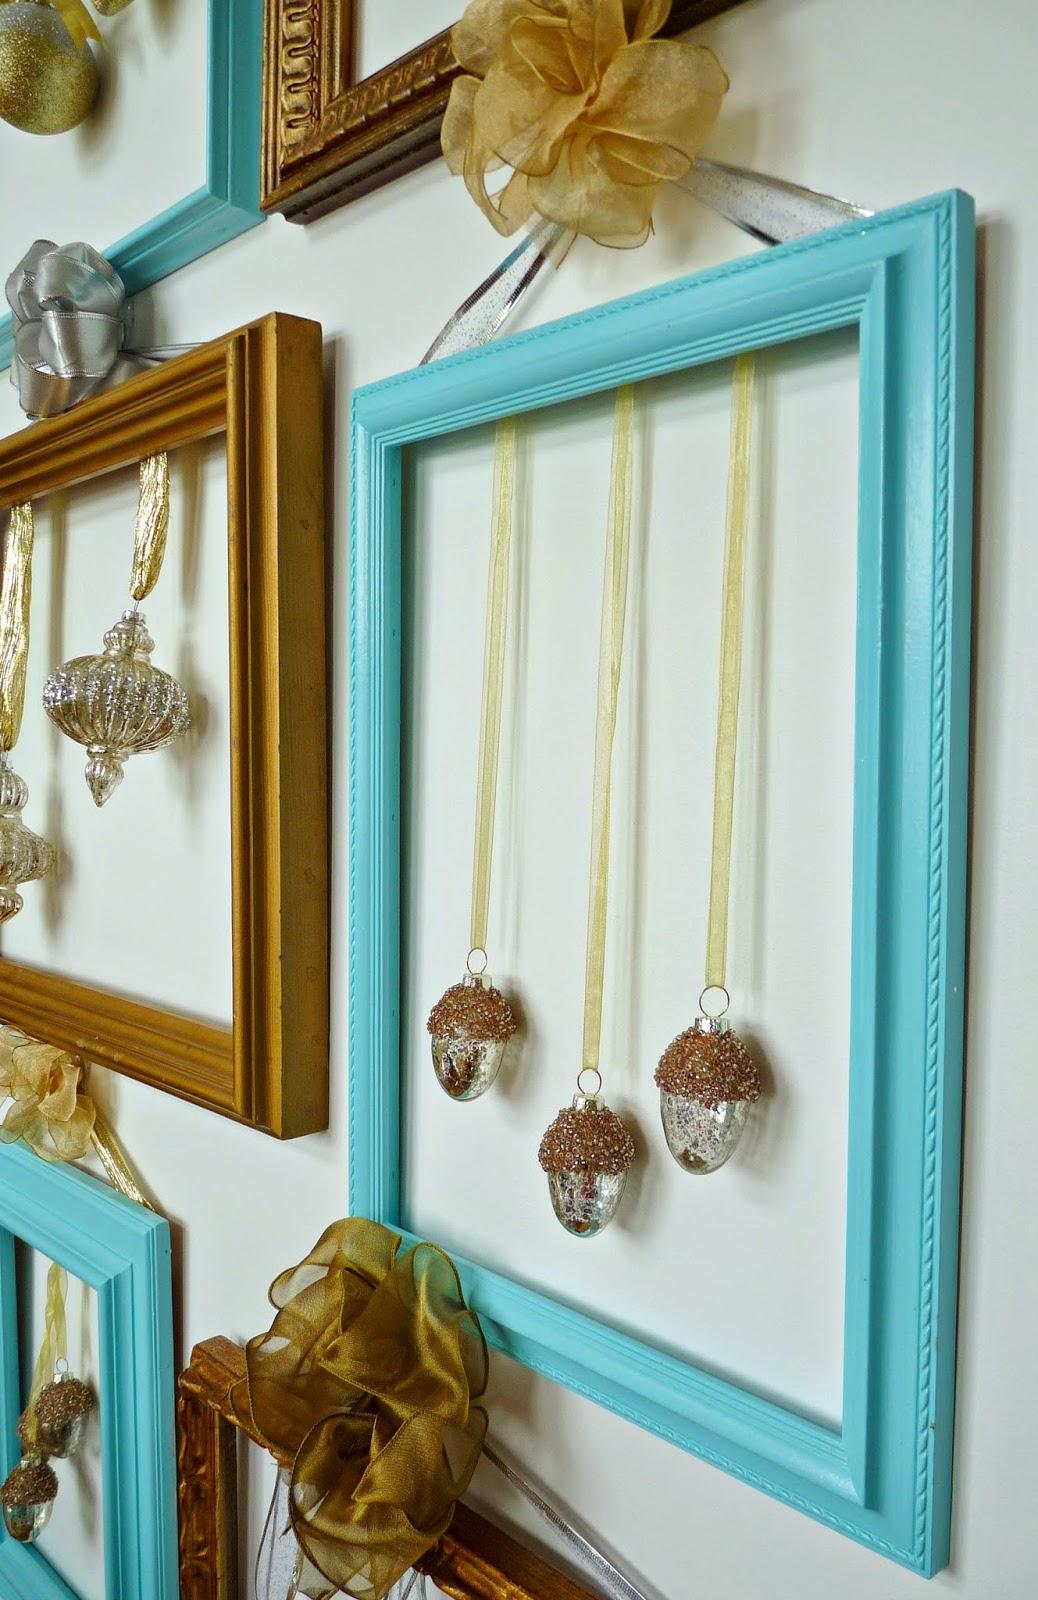 Christmas ornaments displayed on frame